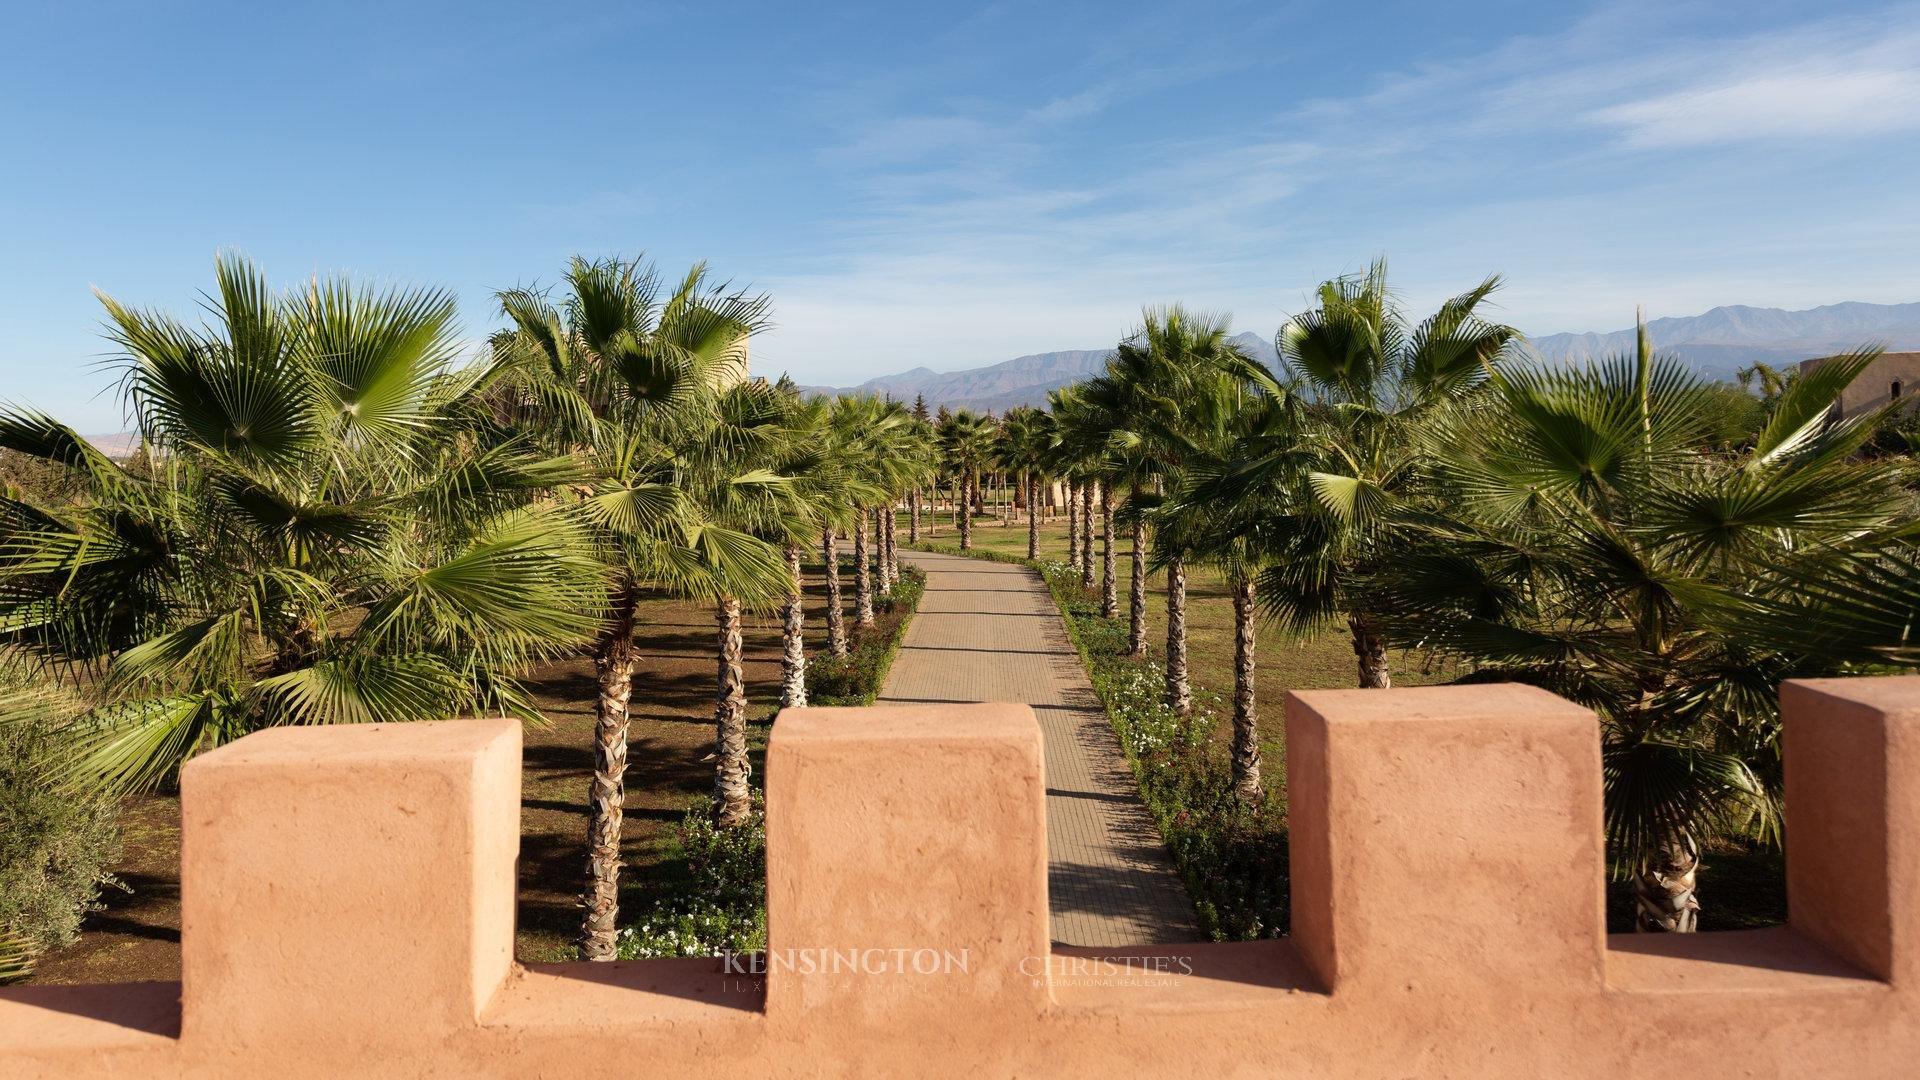 KPPM01175: Villa Bella Vista Luxury Villa Marrakech Morocco